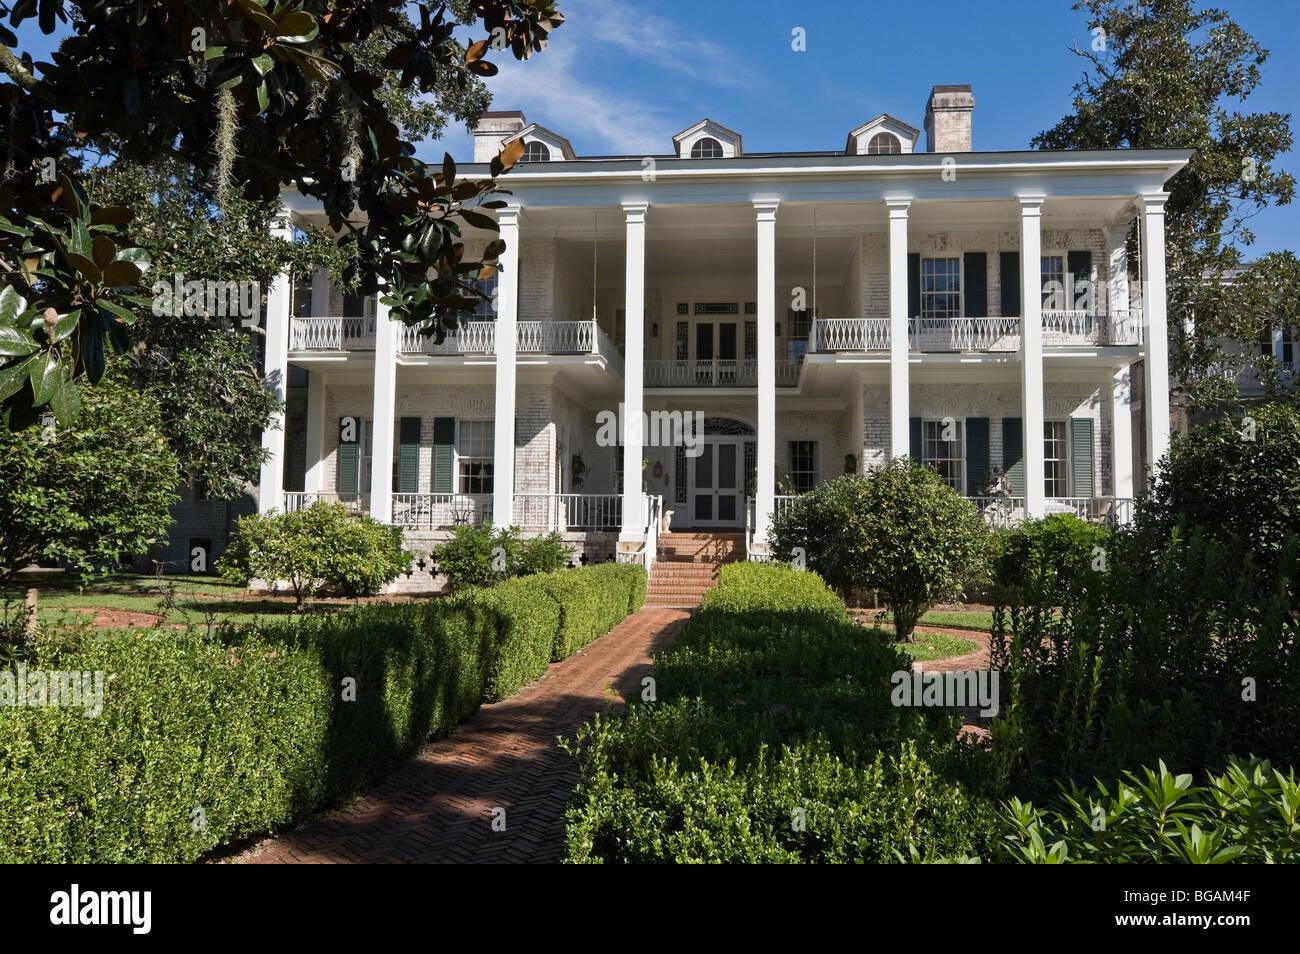 Pebble hill plantation house georgia usa stock photo for Plantation house